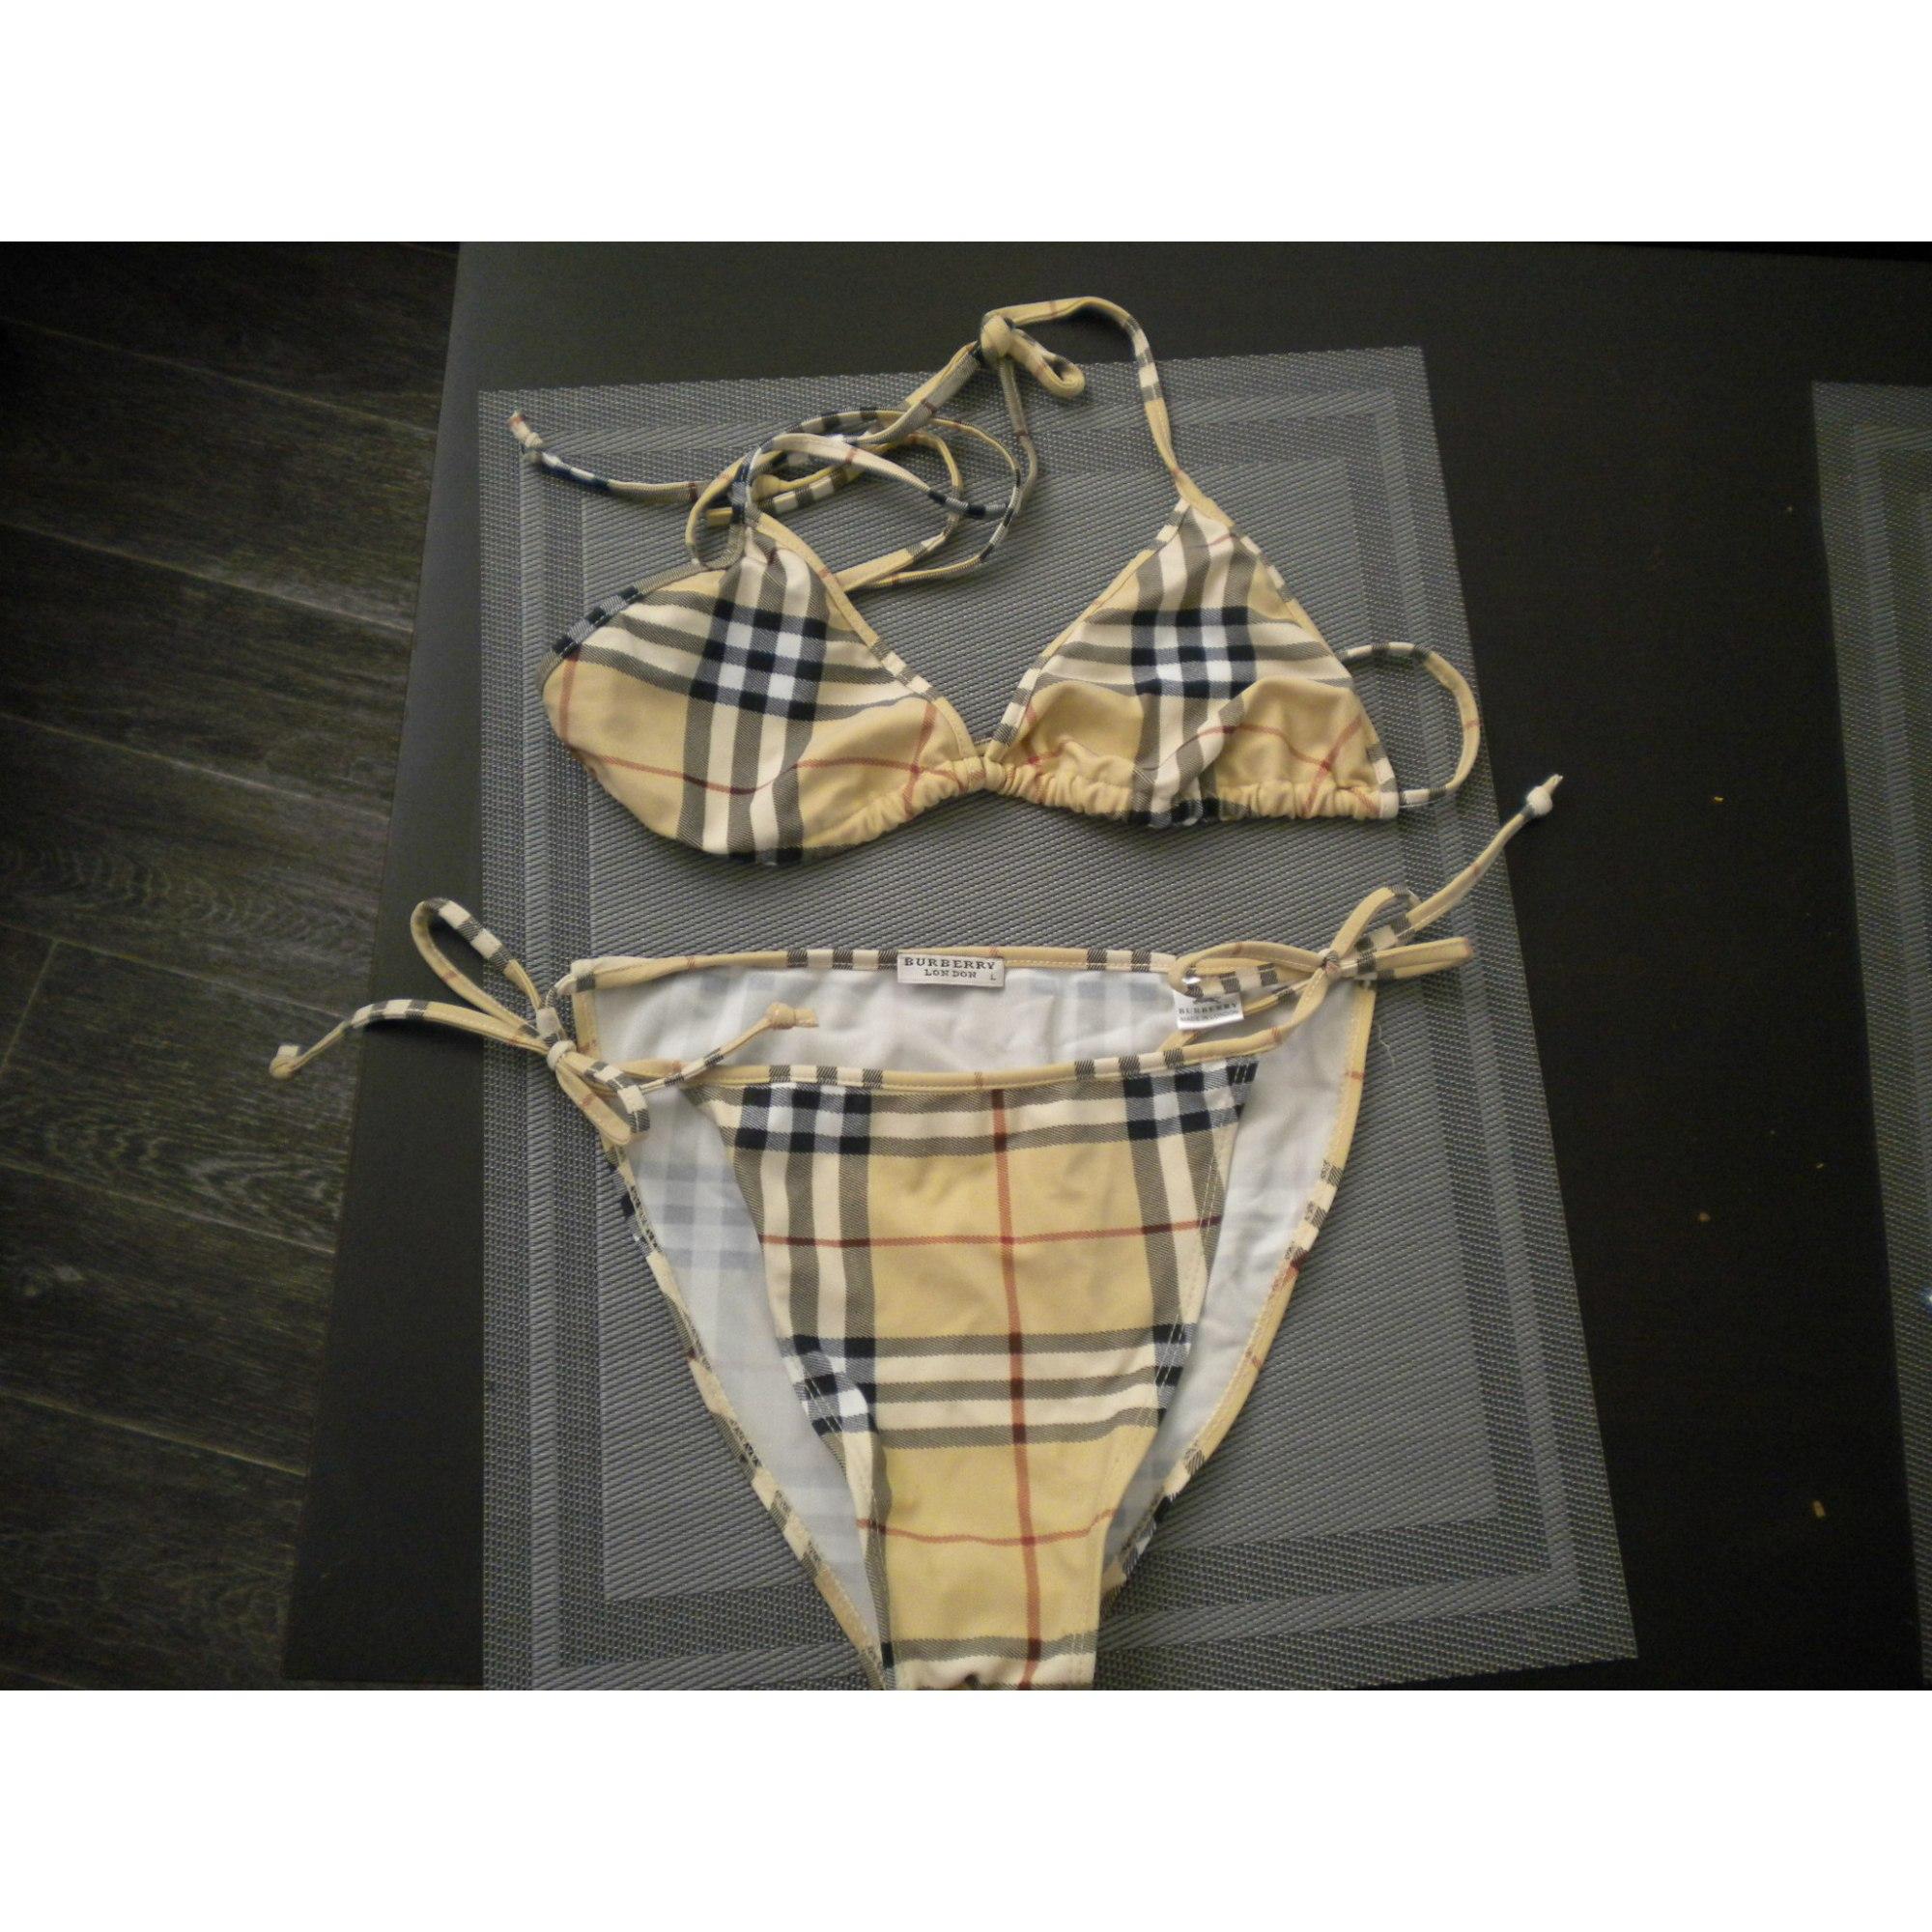 burberry maillot de bain 6ba1607c0b3